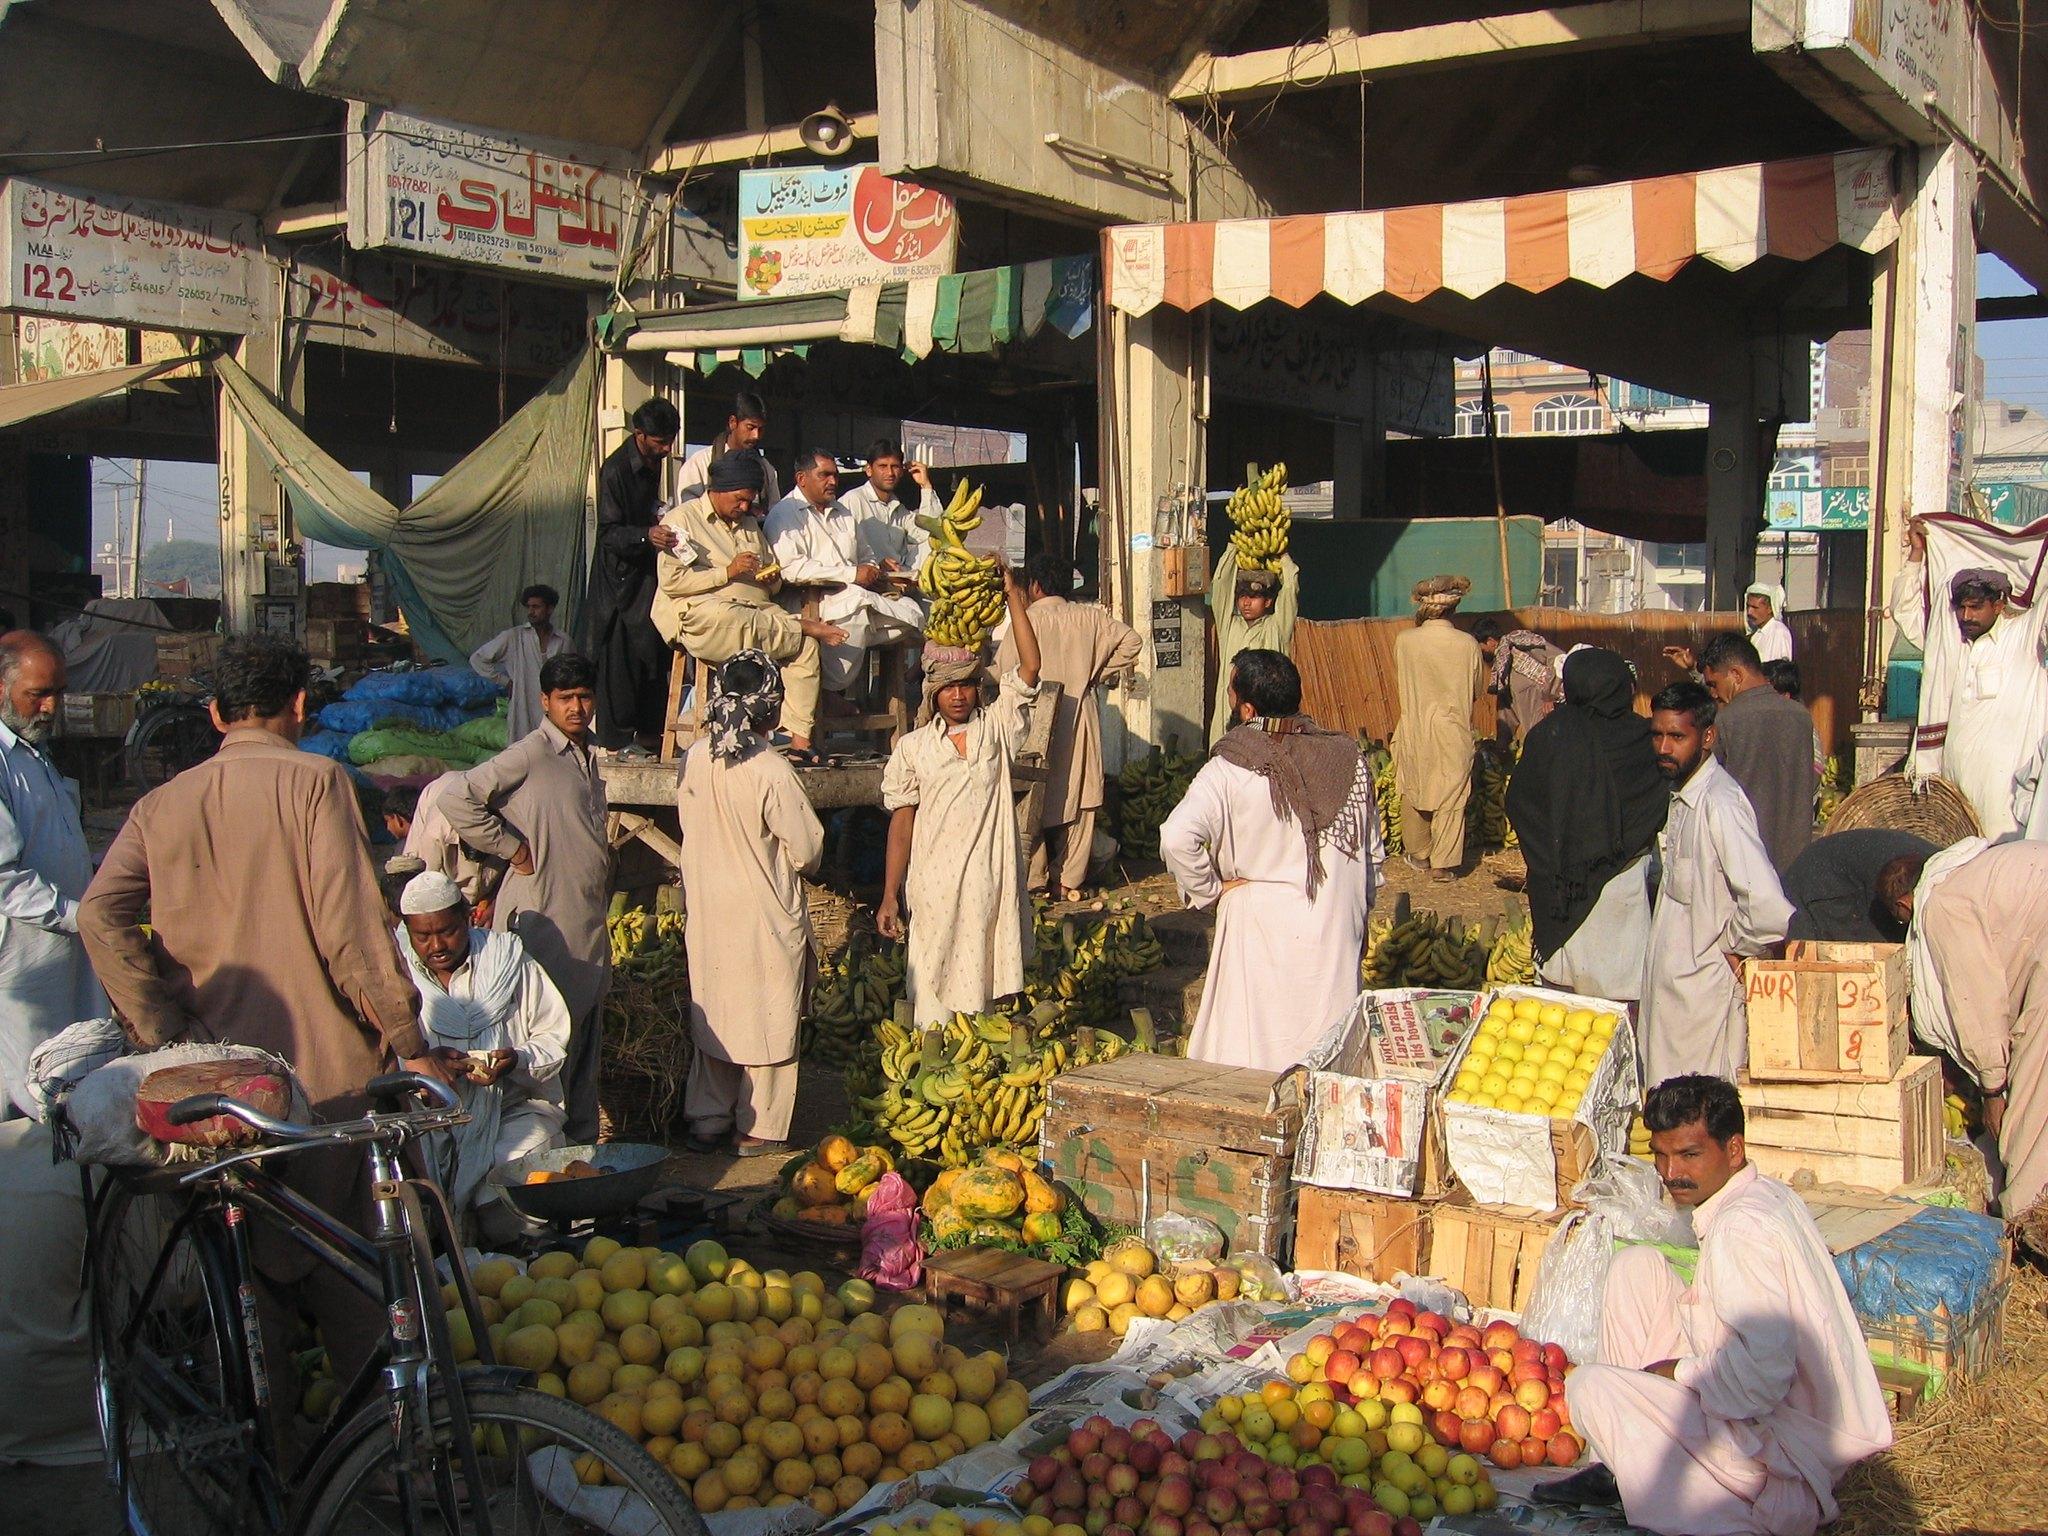 Pakistan Partnership Initiative, Pak Mission Society Providing New Grants and Training for Christian Pakistani Entrepreneurs